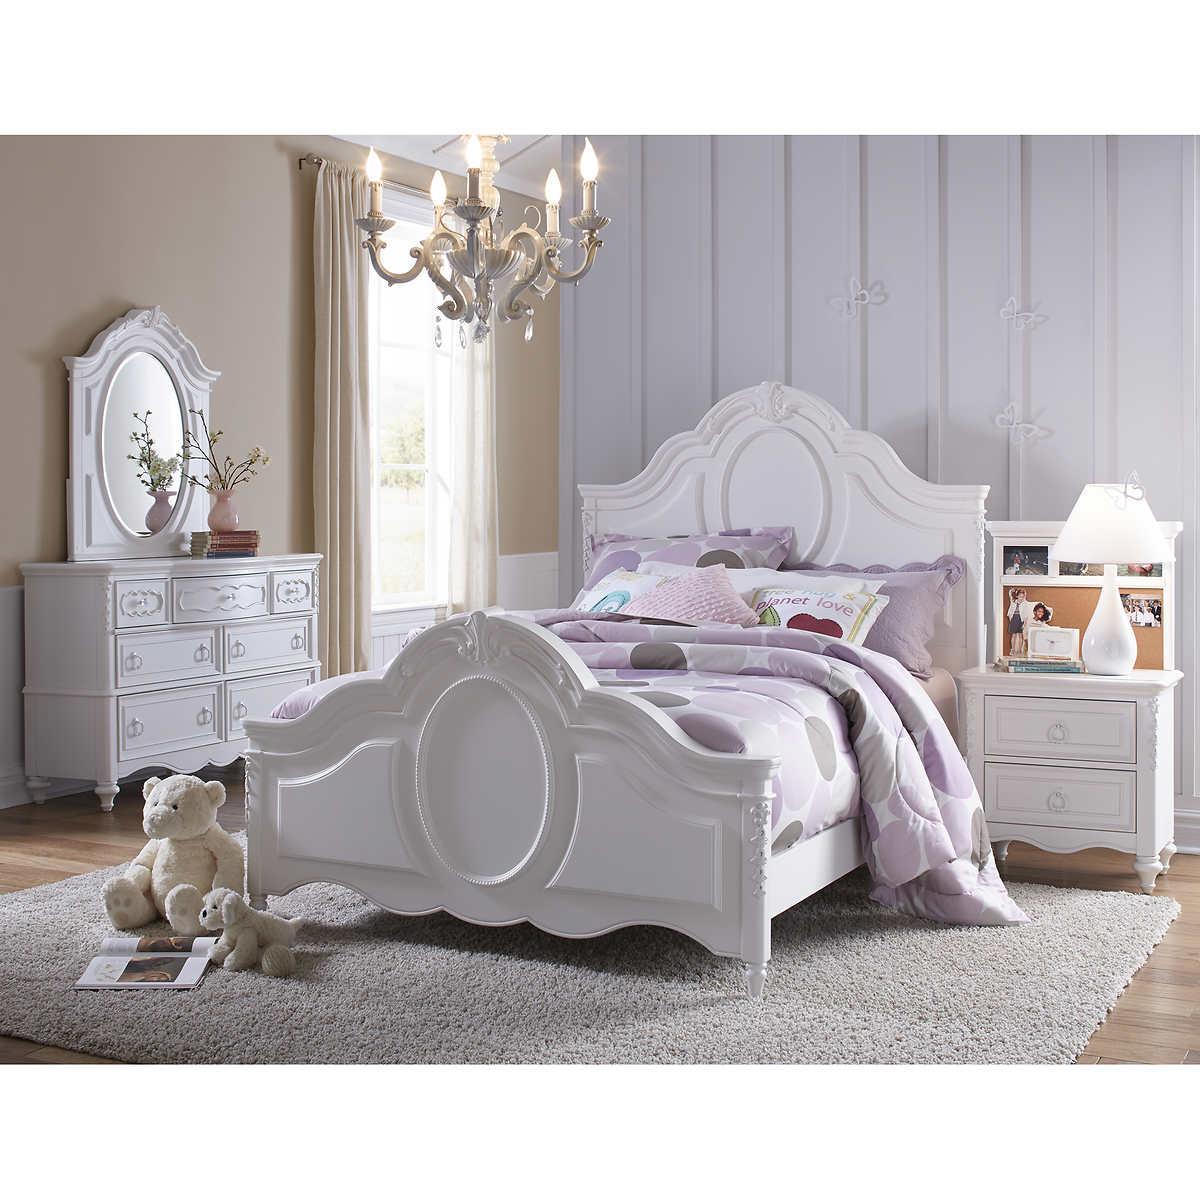 Ava 4 Piece Twin Bedroom Set